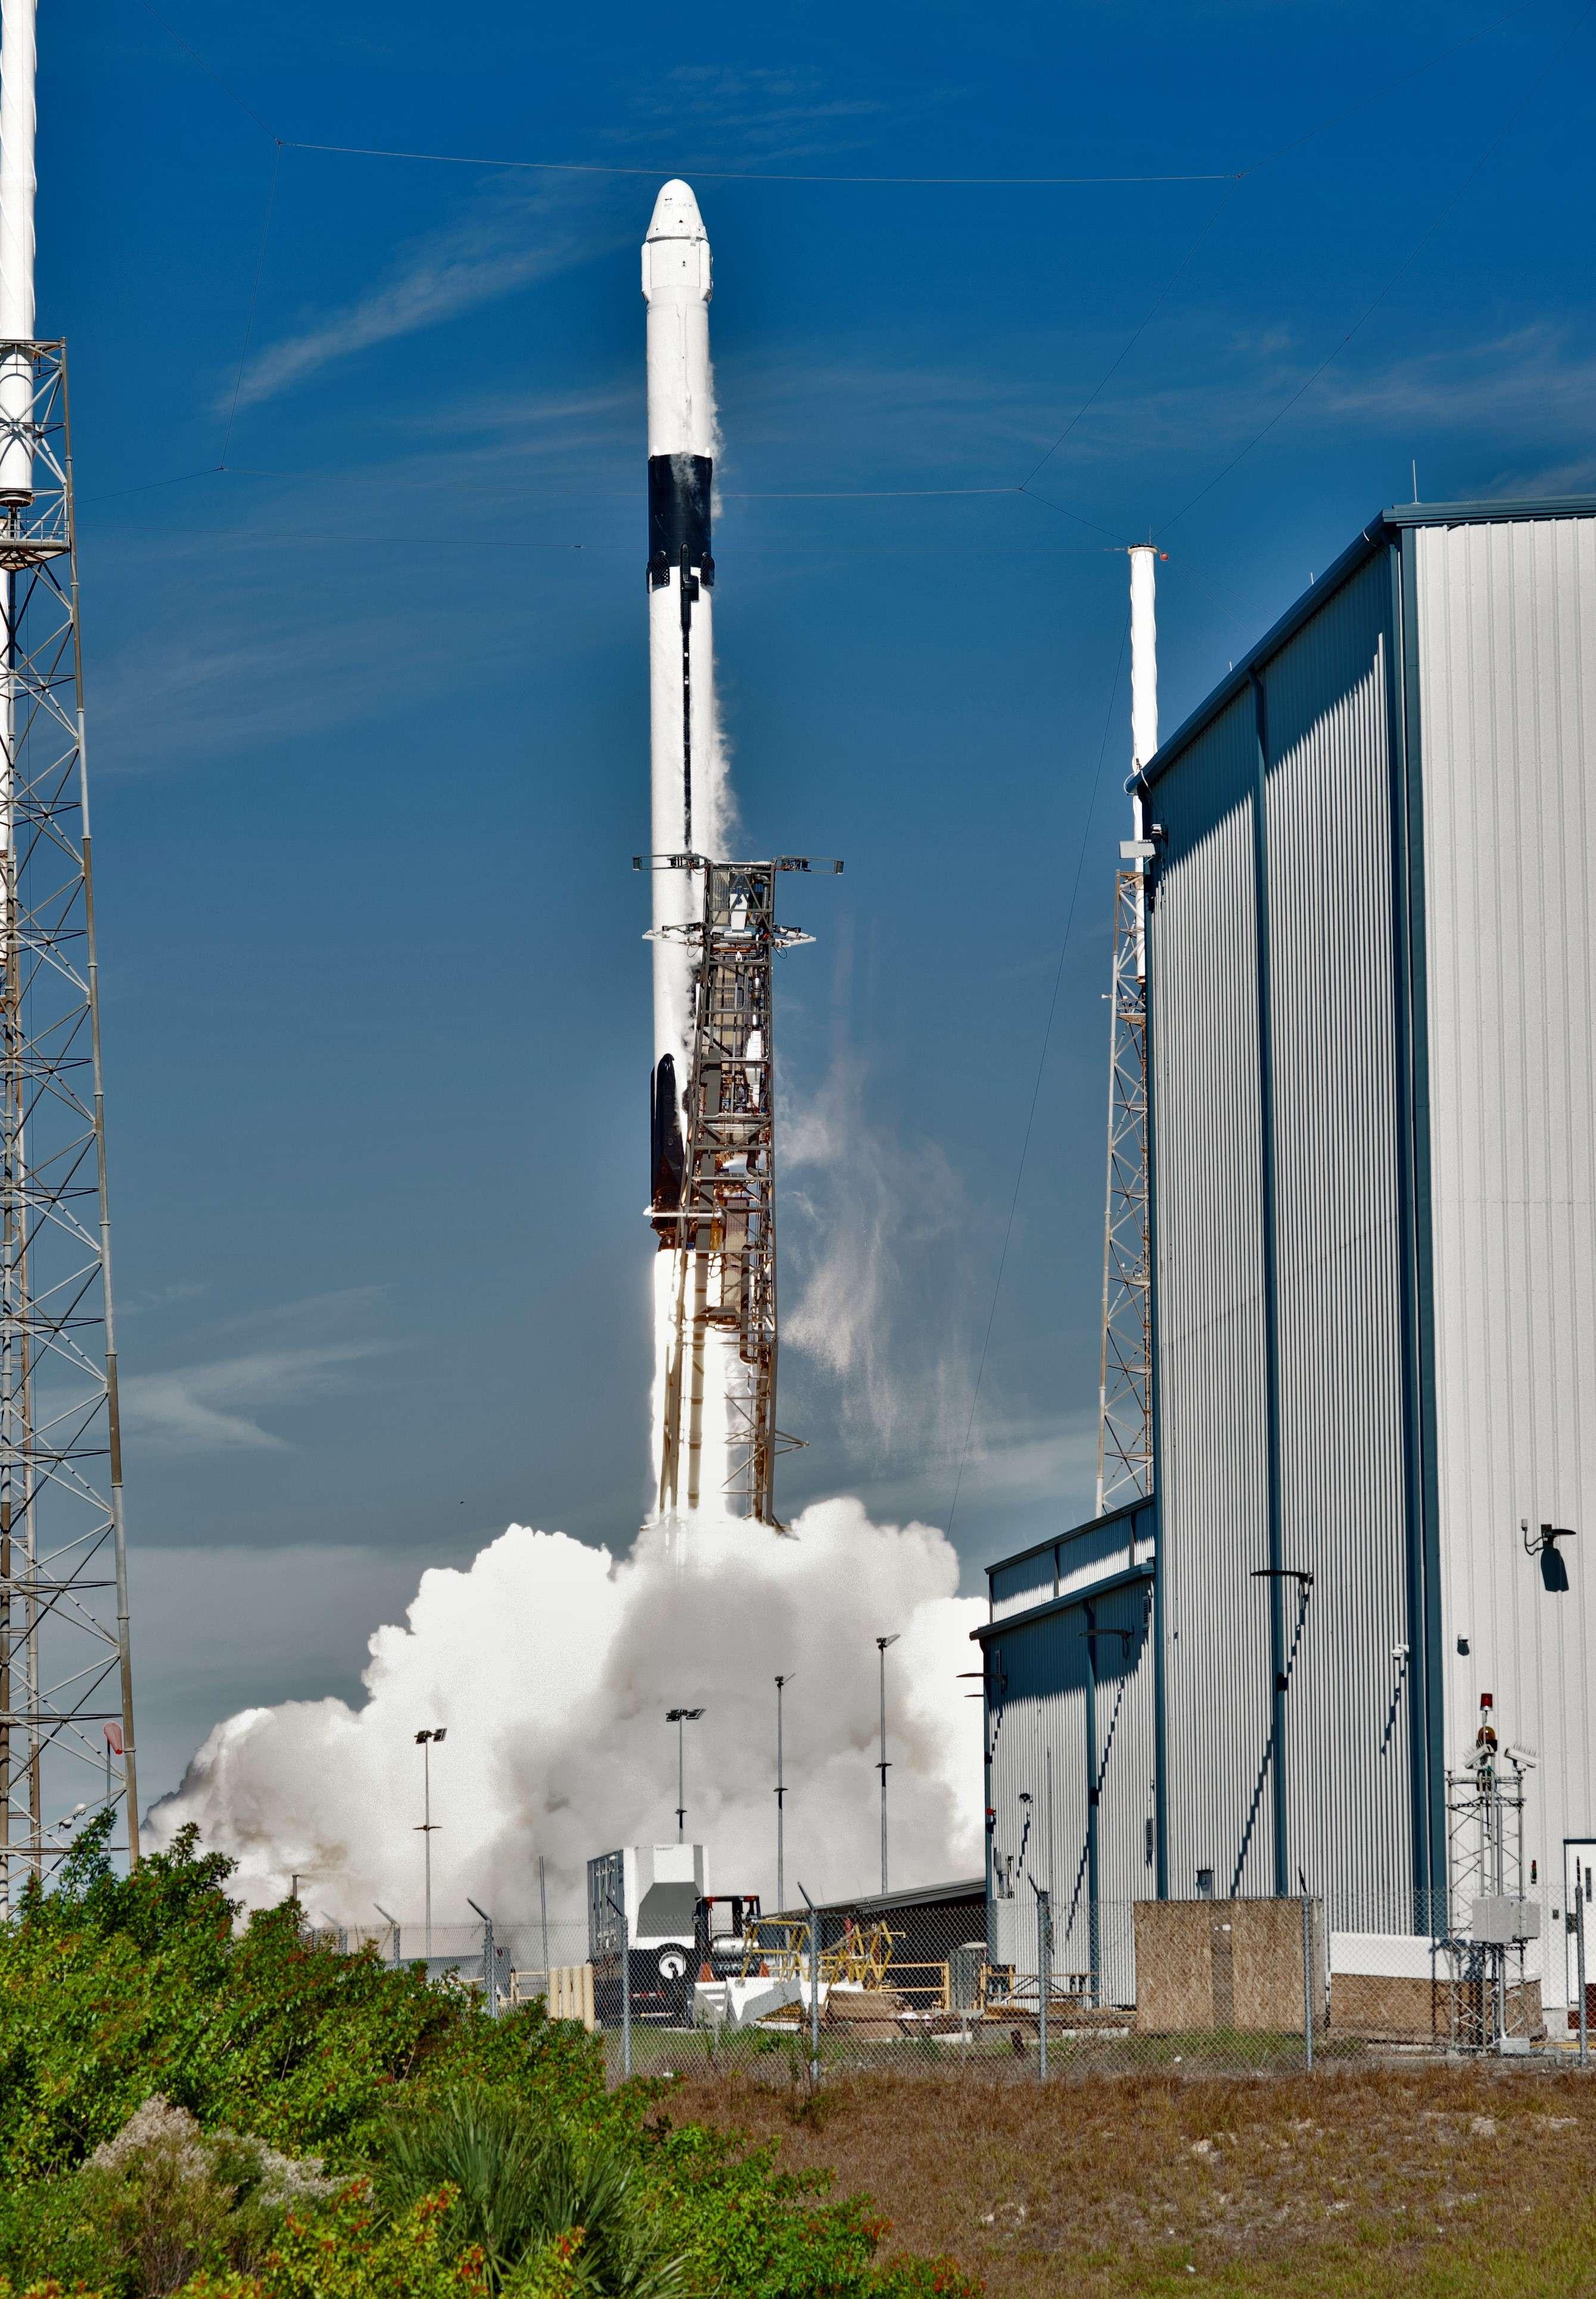 Falcon 9 B1050 Cargo Dragon CRS-16 launch (NASA) 8(c)